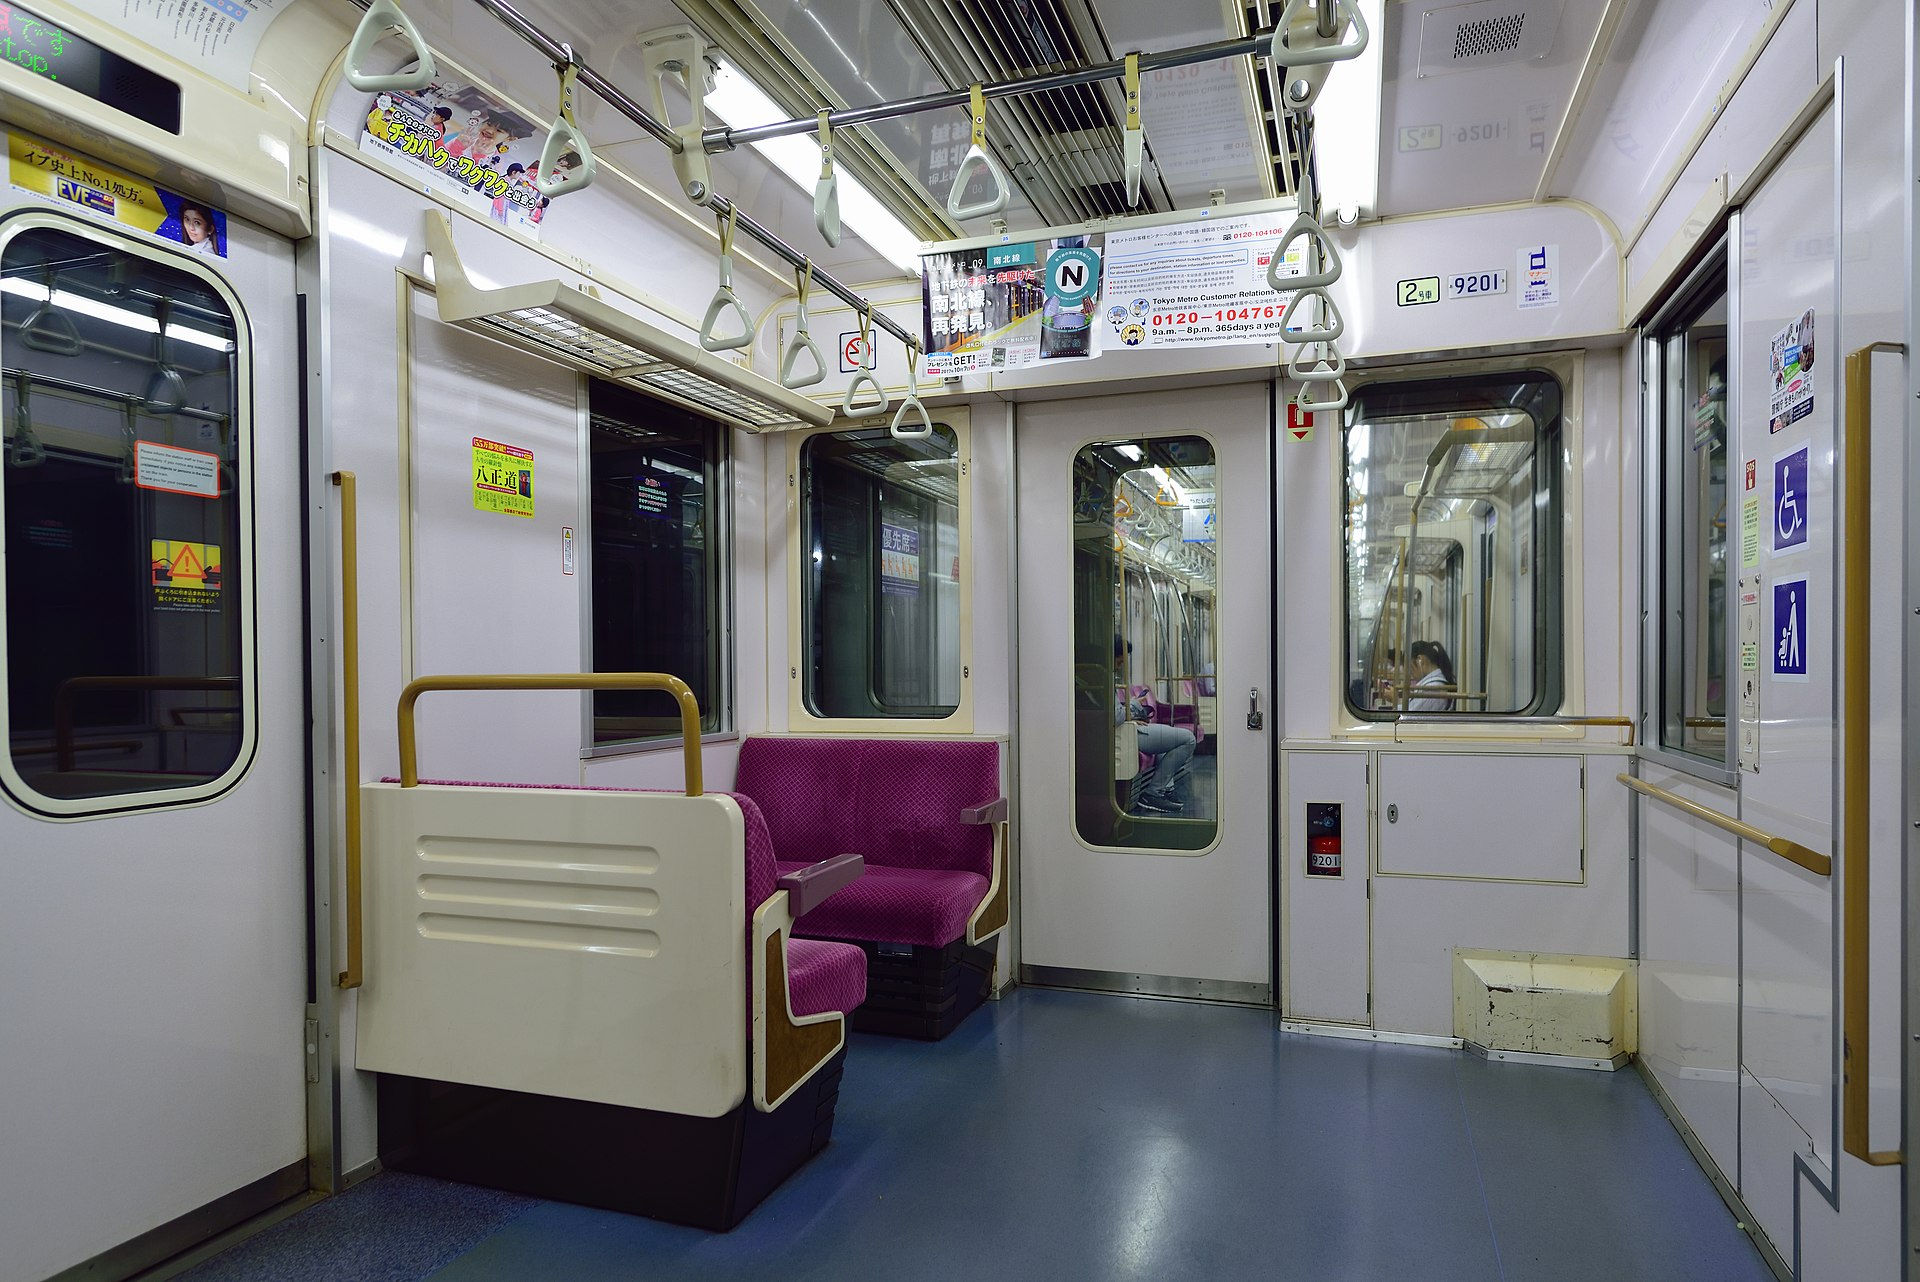 https://upload.wikimedia.org/wikipedia/commons/thumb/1/13/Tokyo_Metro_9000_series_Prototype_car_interior_3_20170907.jpg/1920px-Tokyo_Metro_9000_series_Prototype_car_interior_3_20170907.jpg